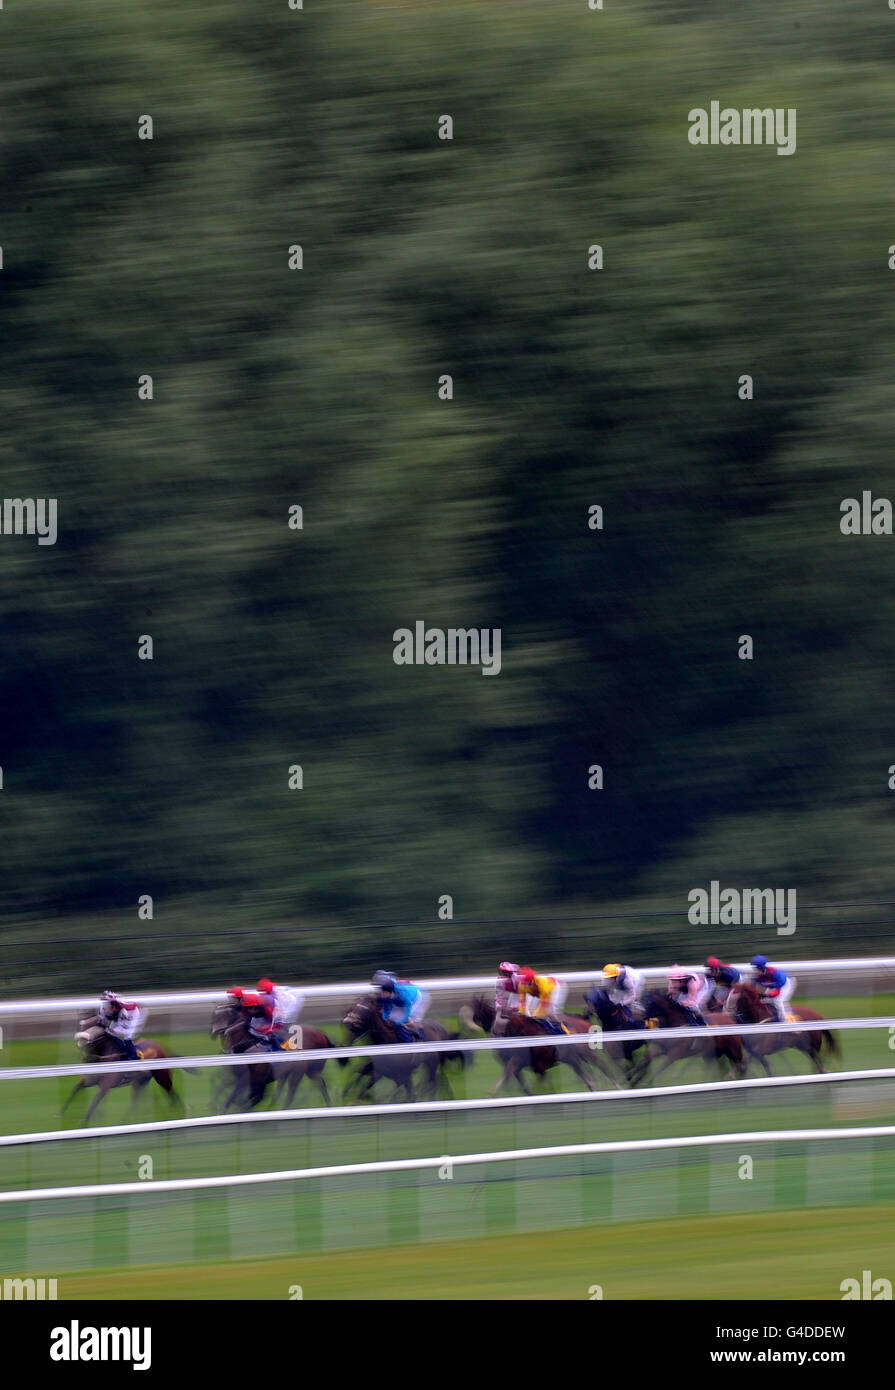 Horse Racing - Ladies Evening - Chester Racecourse - Stock Image